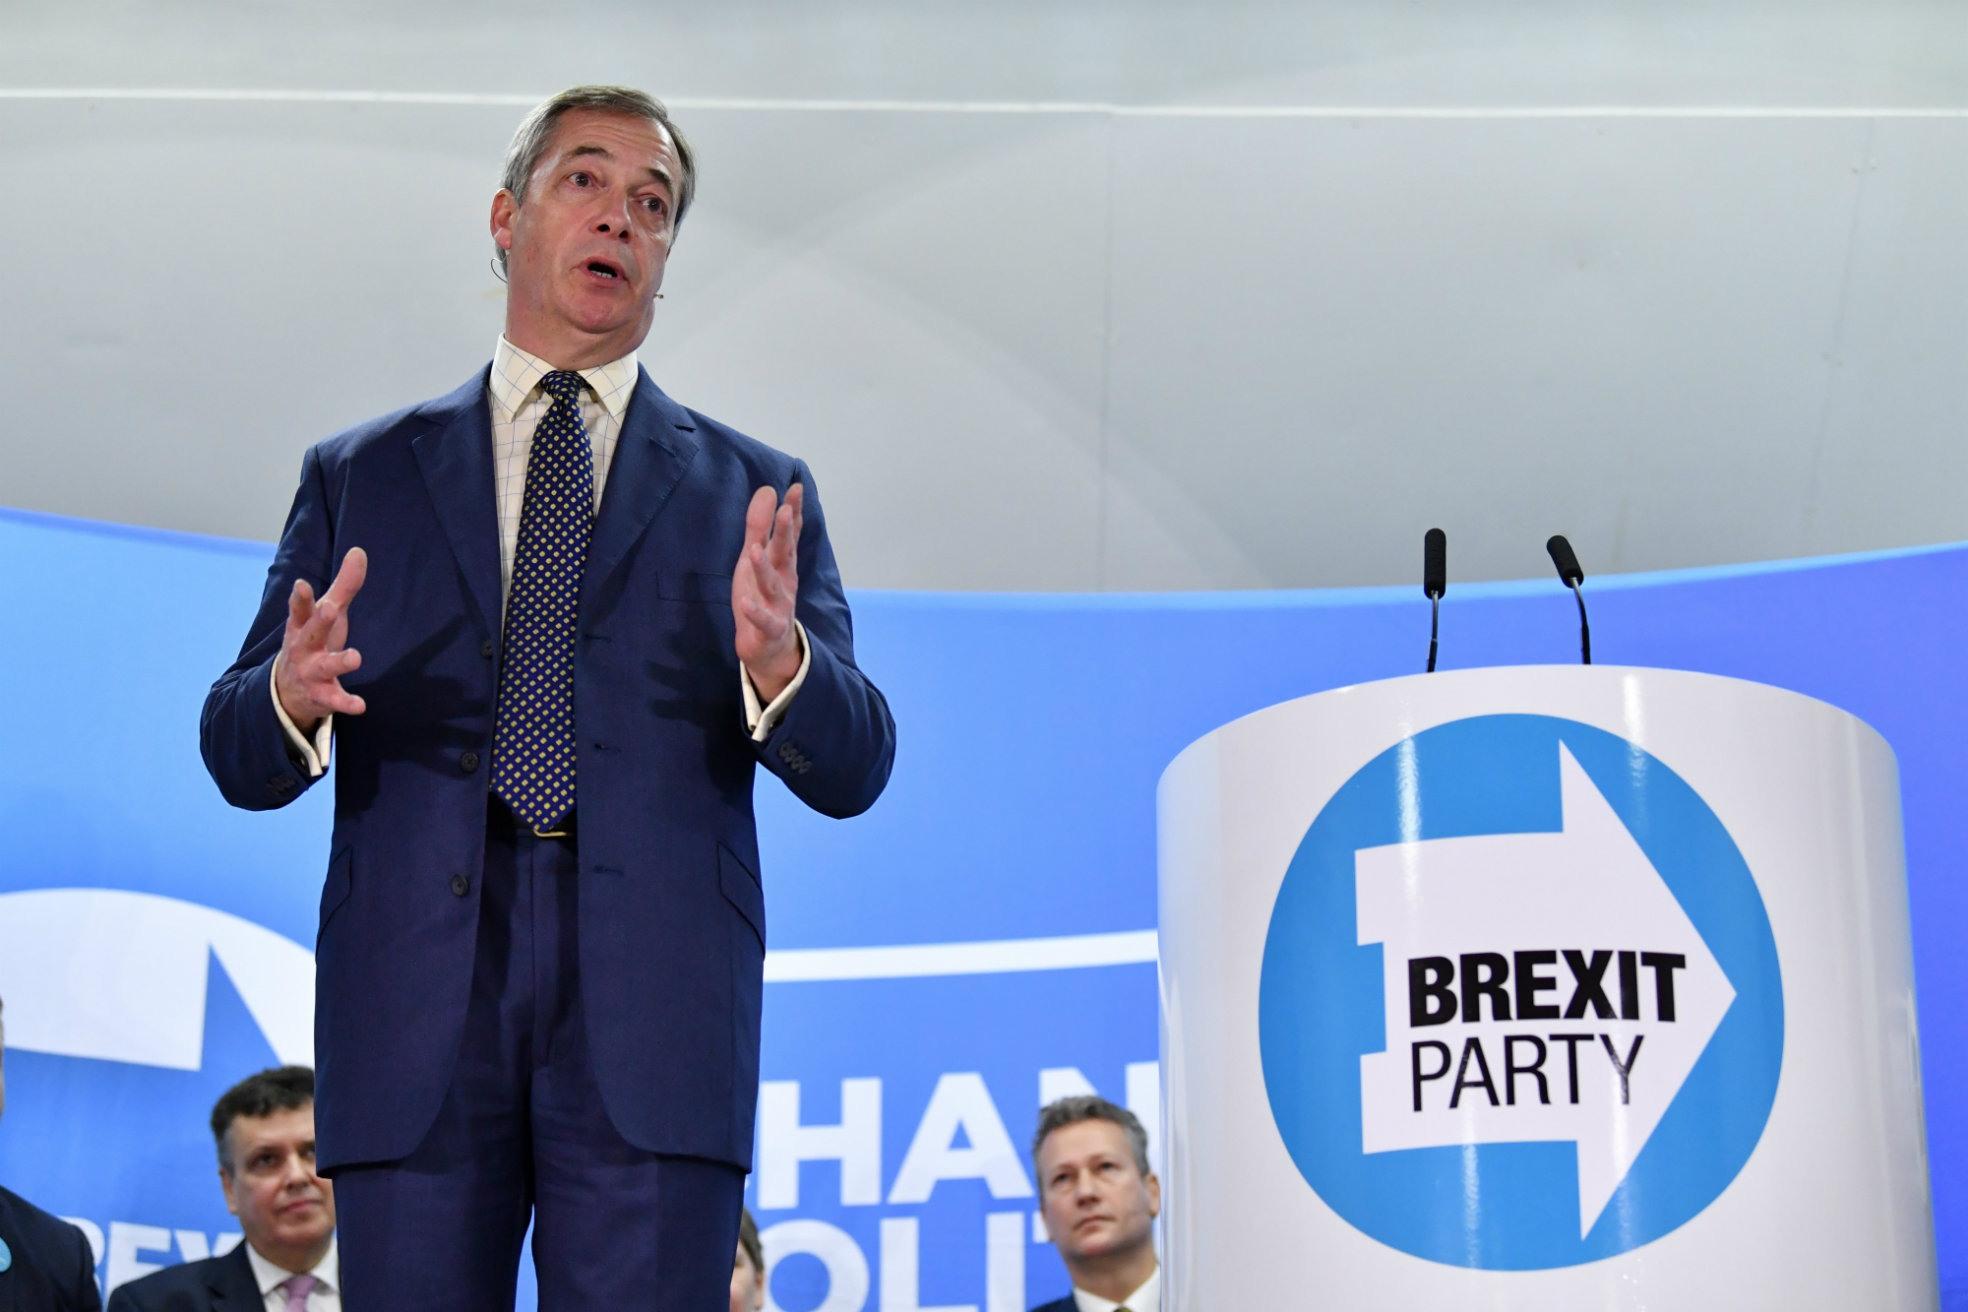 Nigel Farage Brexitparty campagne